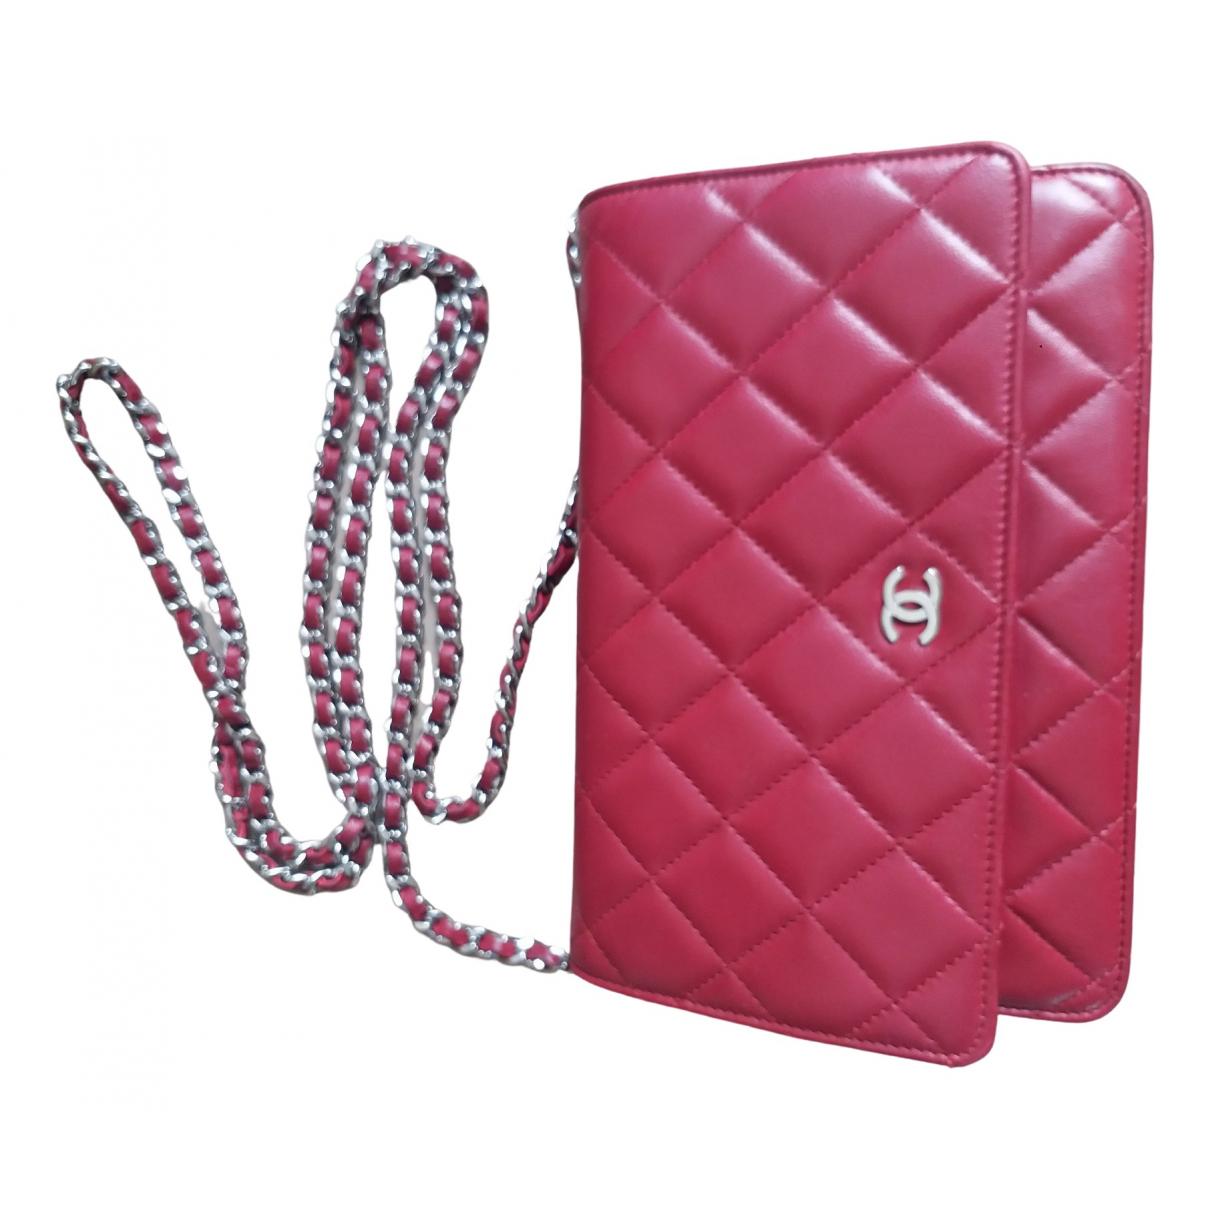 Chanel Wallet on Chain Handtasche in  Bordeauxrot Leder